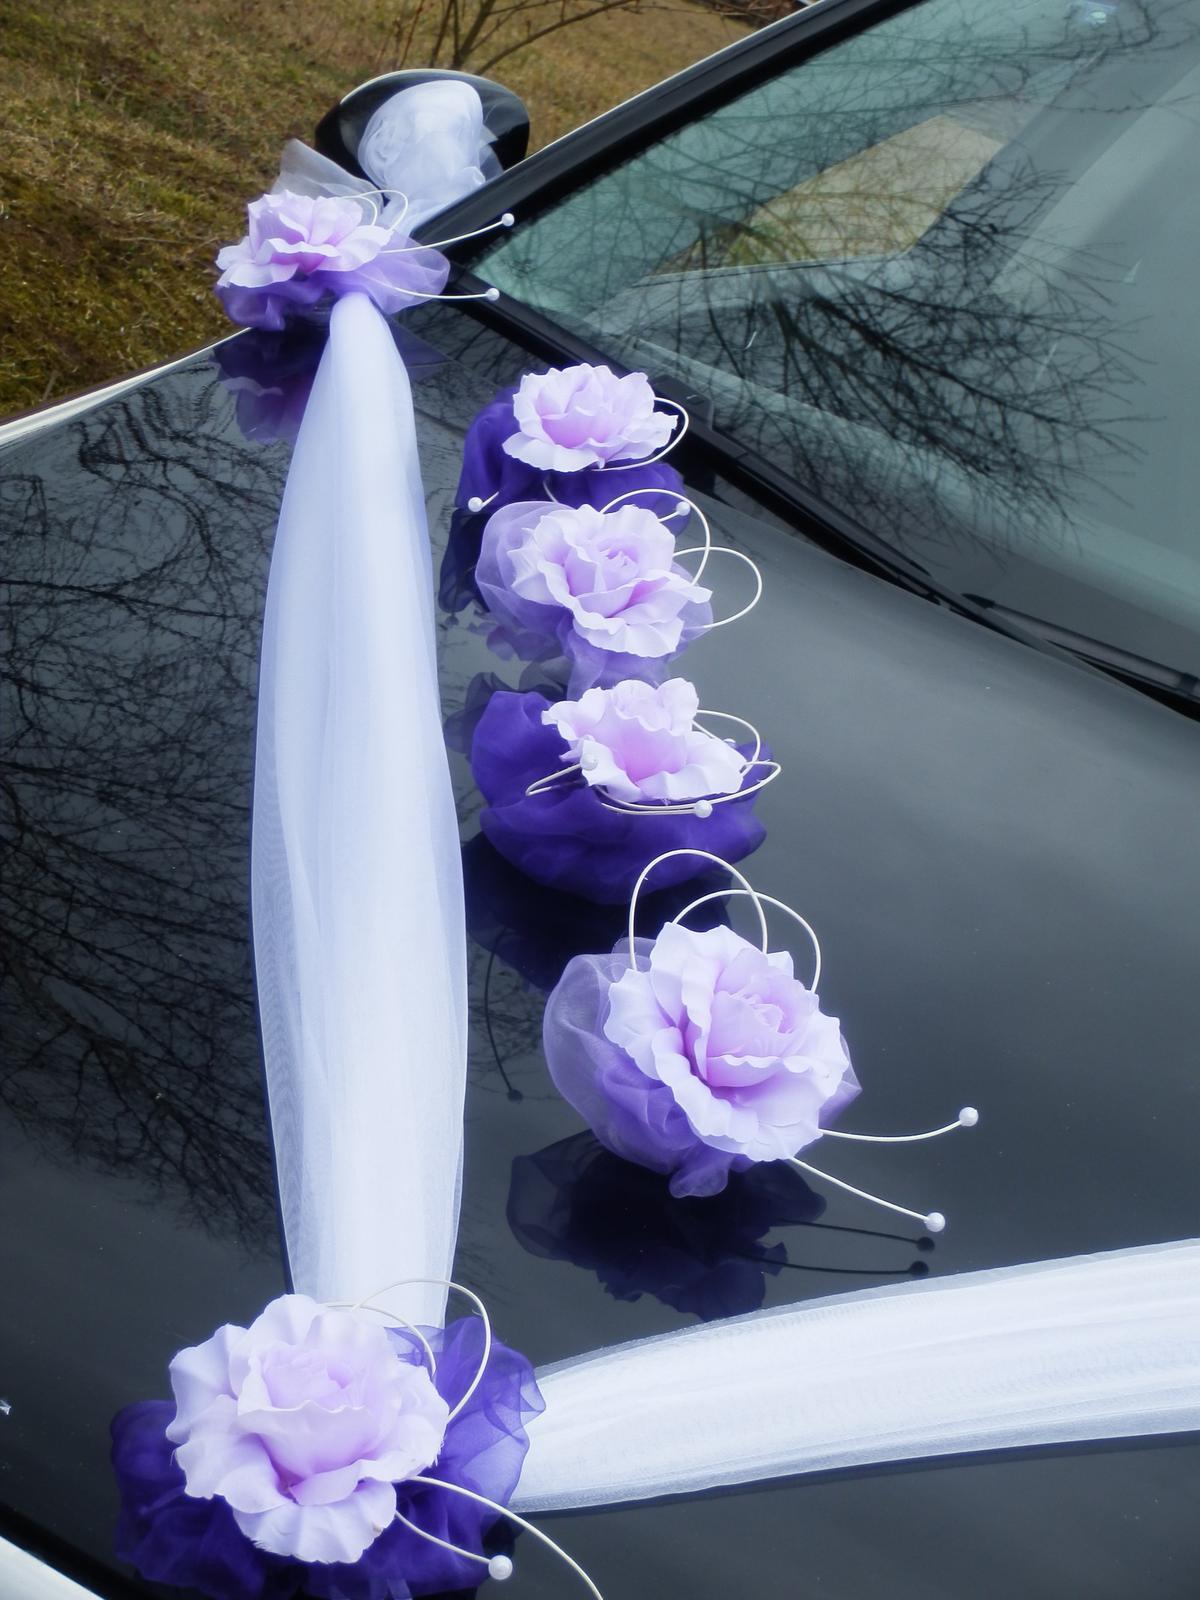 Svatebni Dekorace Vyzdoba Na Auto Ruze S Prisavkou 59 Kc